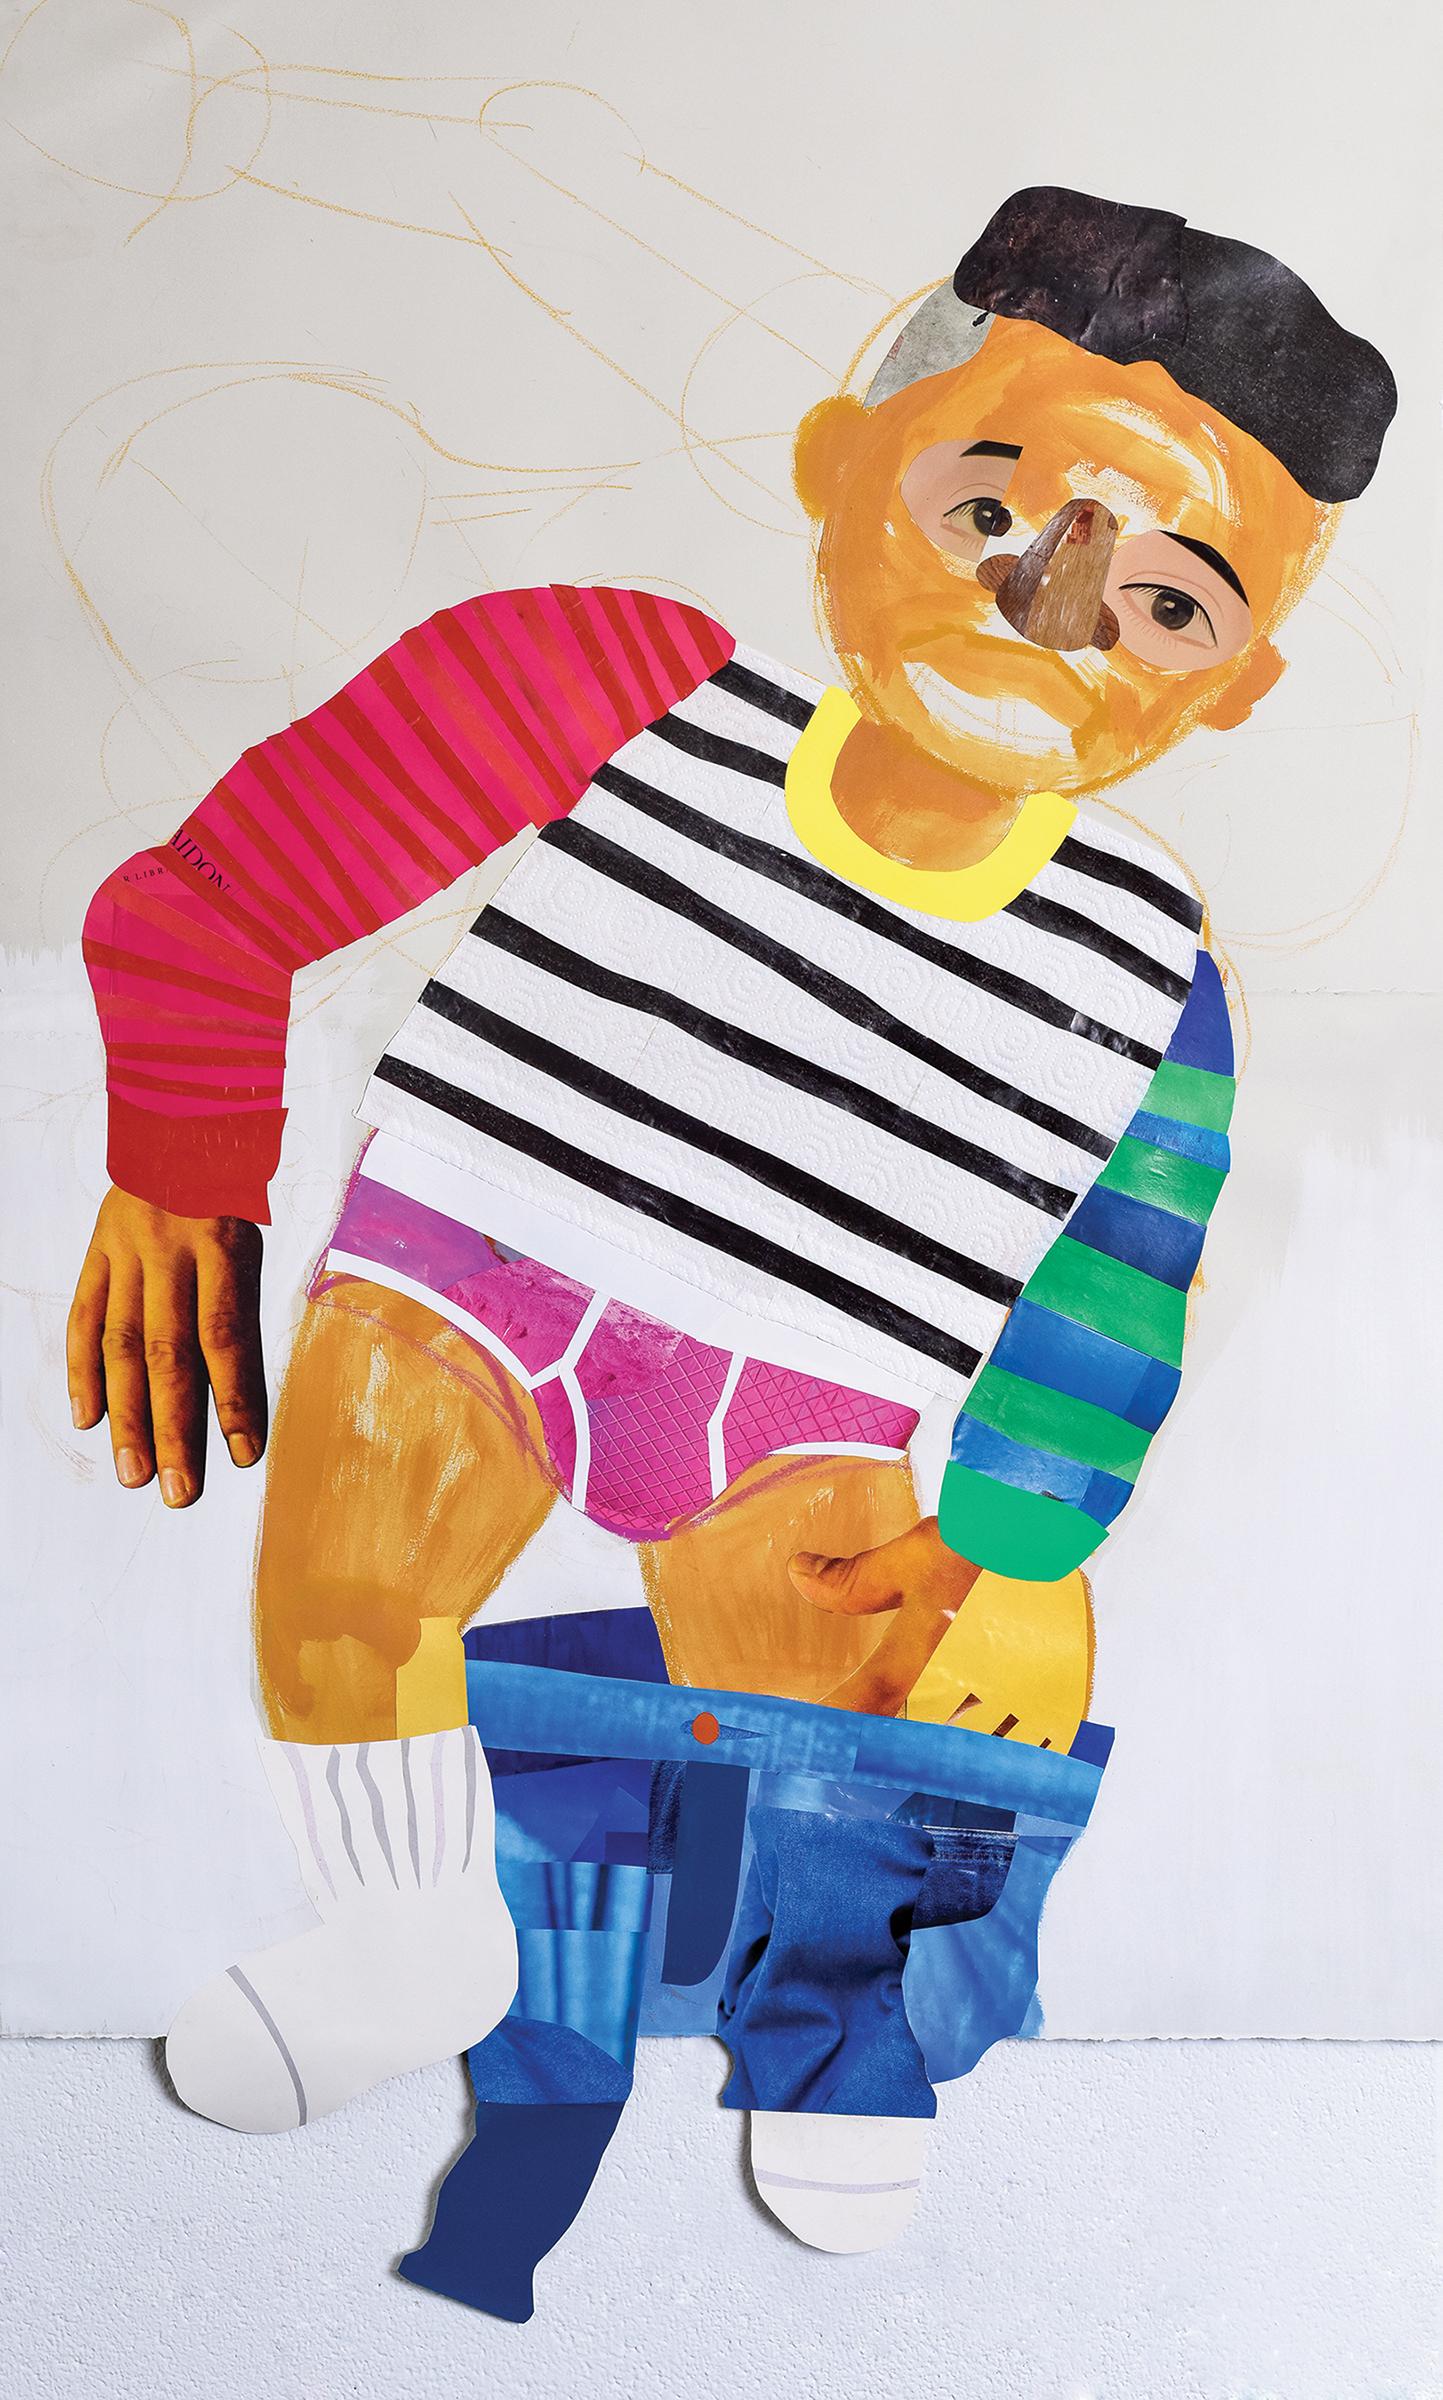 Clotilde Jiménez  Self-Portrait in Pink Underwear , 2016  mixed media collage on paper 48h x 30w in